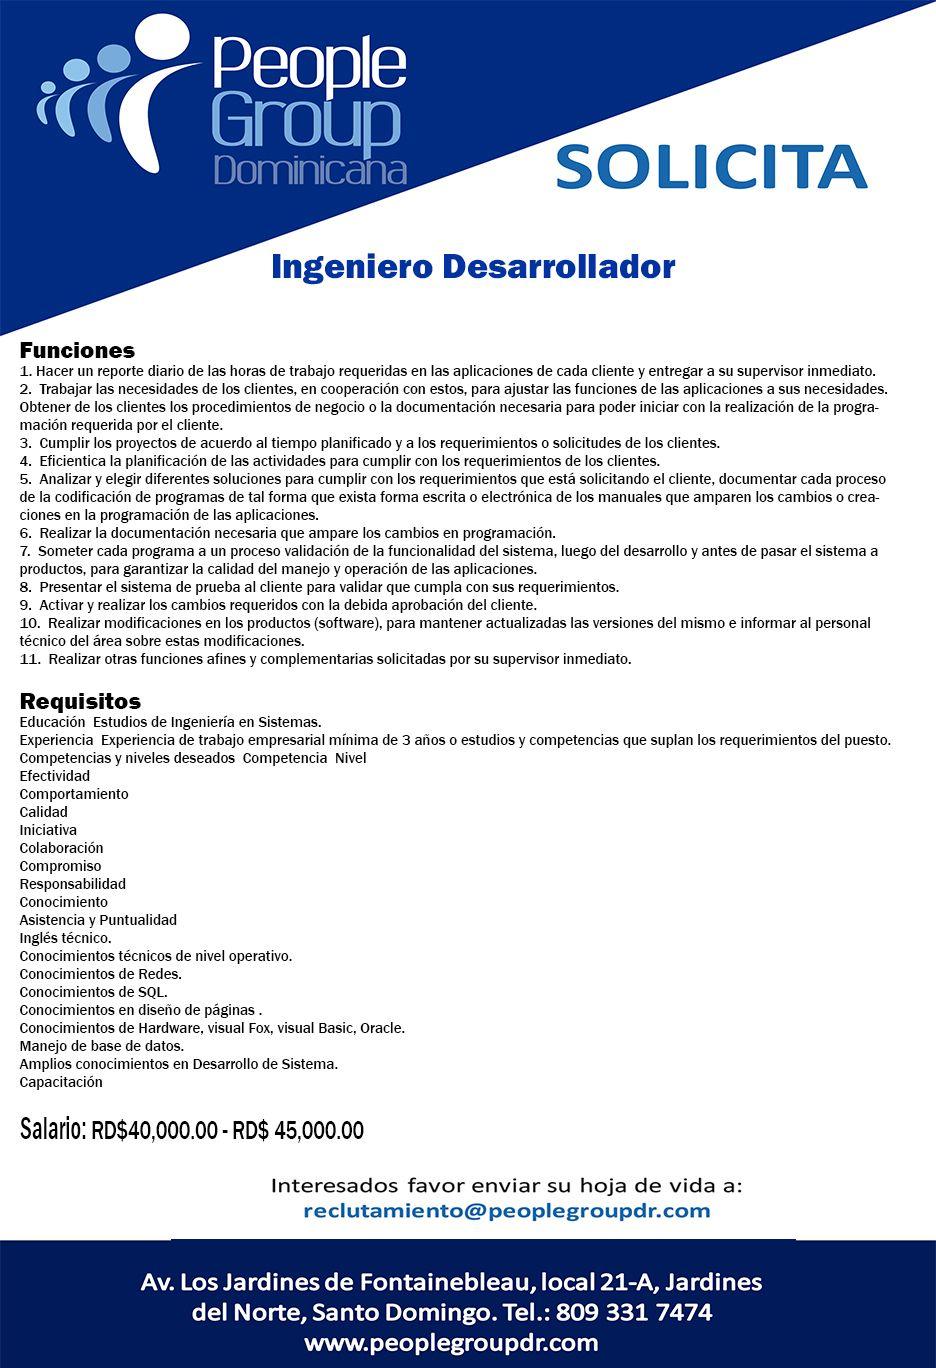 Nueva Oferta de Empleo. Mandar cv a reclutamiento@peoplegroupdr.com ...